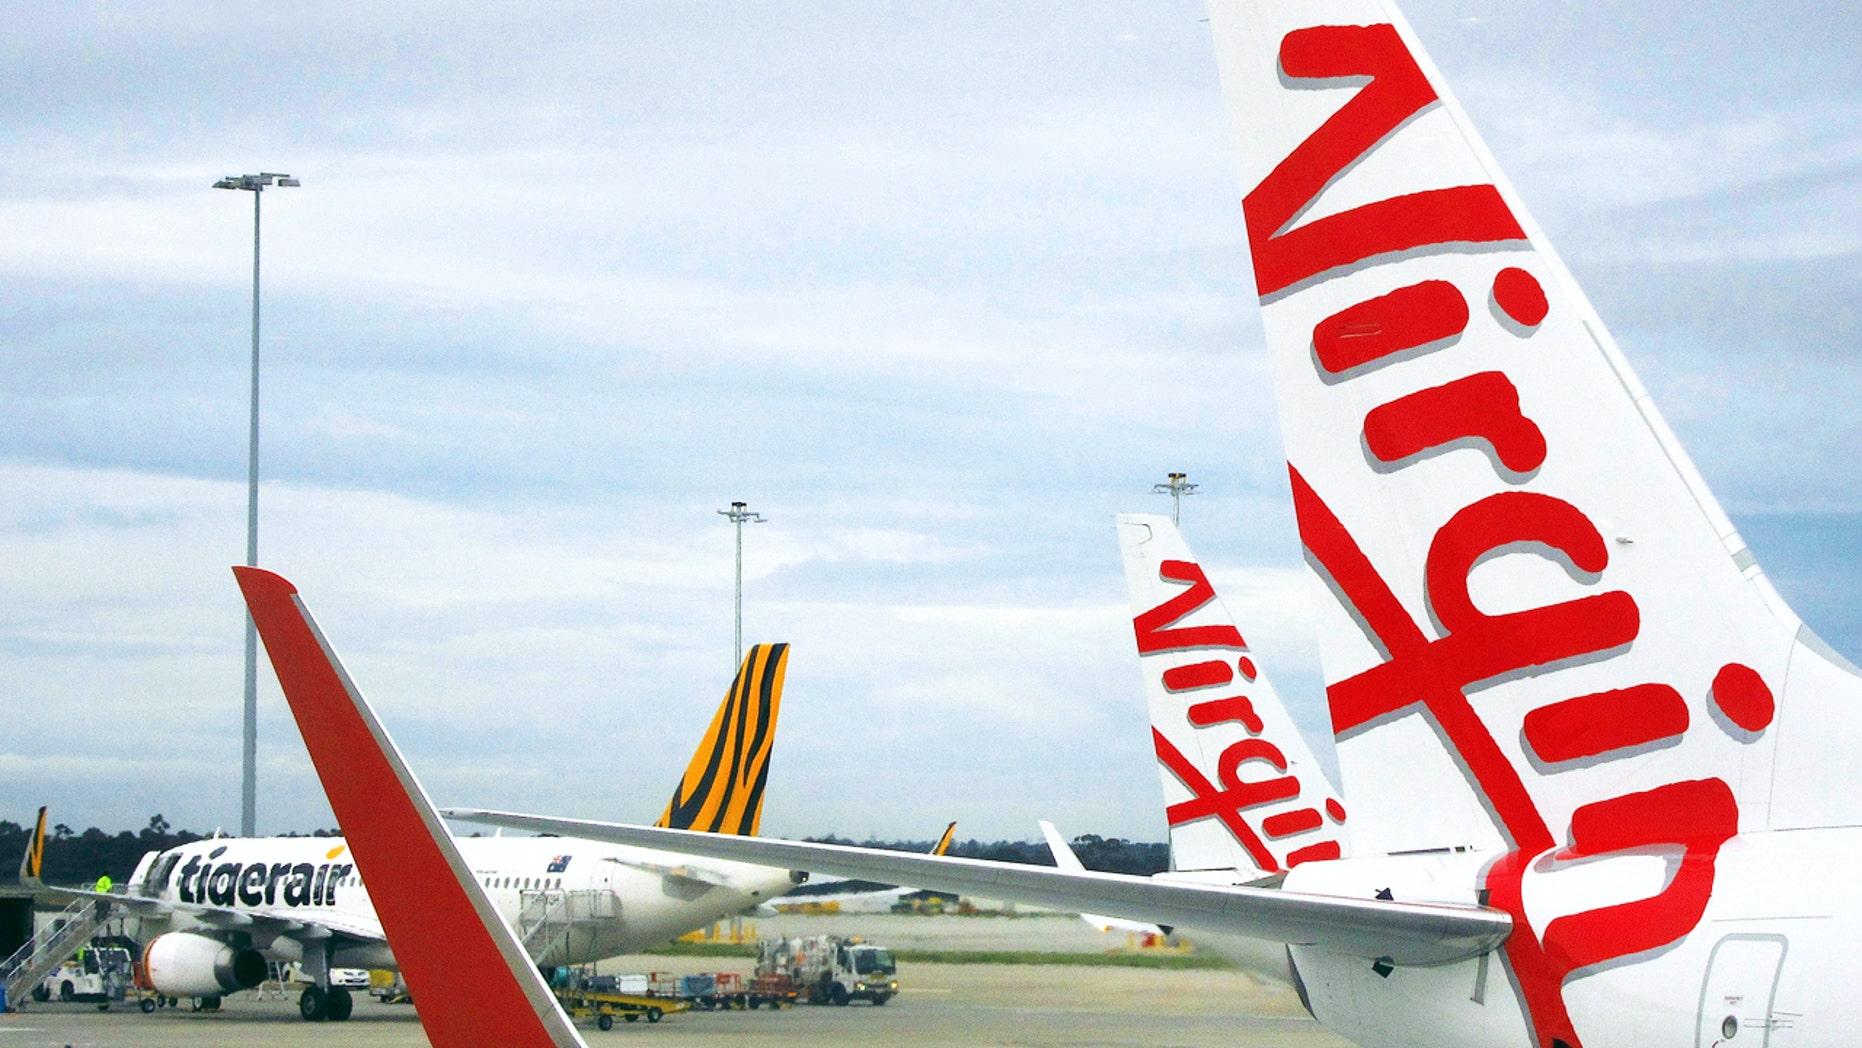 A Tigerair Australia plane sits on the tarmac near Virgin Australia aircraft at Melbourne's Tullamarine International Airport, Australia, October 12, 2016. Picture taken October 12, 2016.     REUTERS/David Gray - RTX2ZF7U